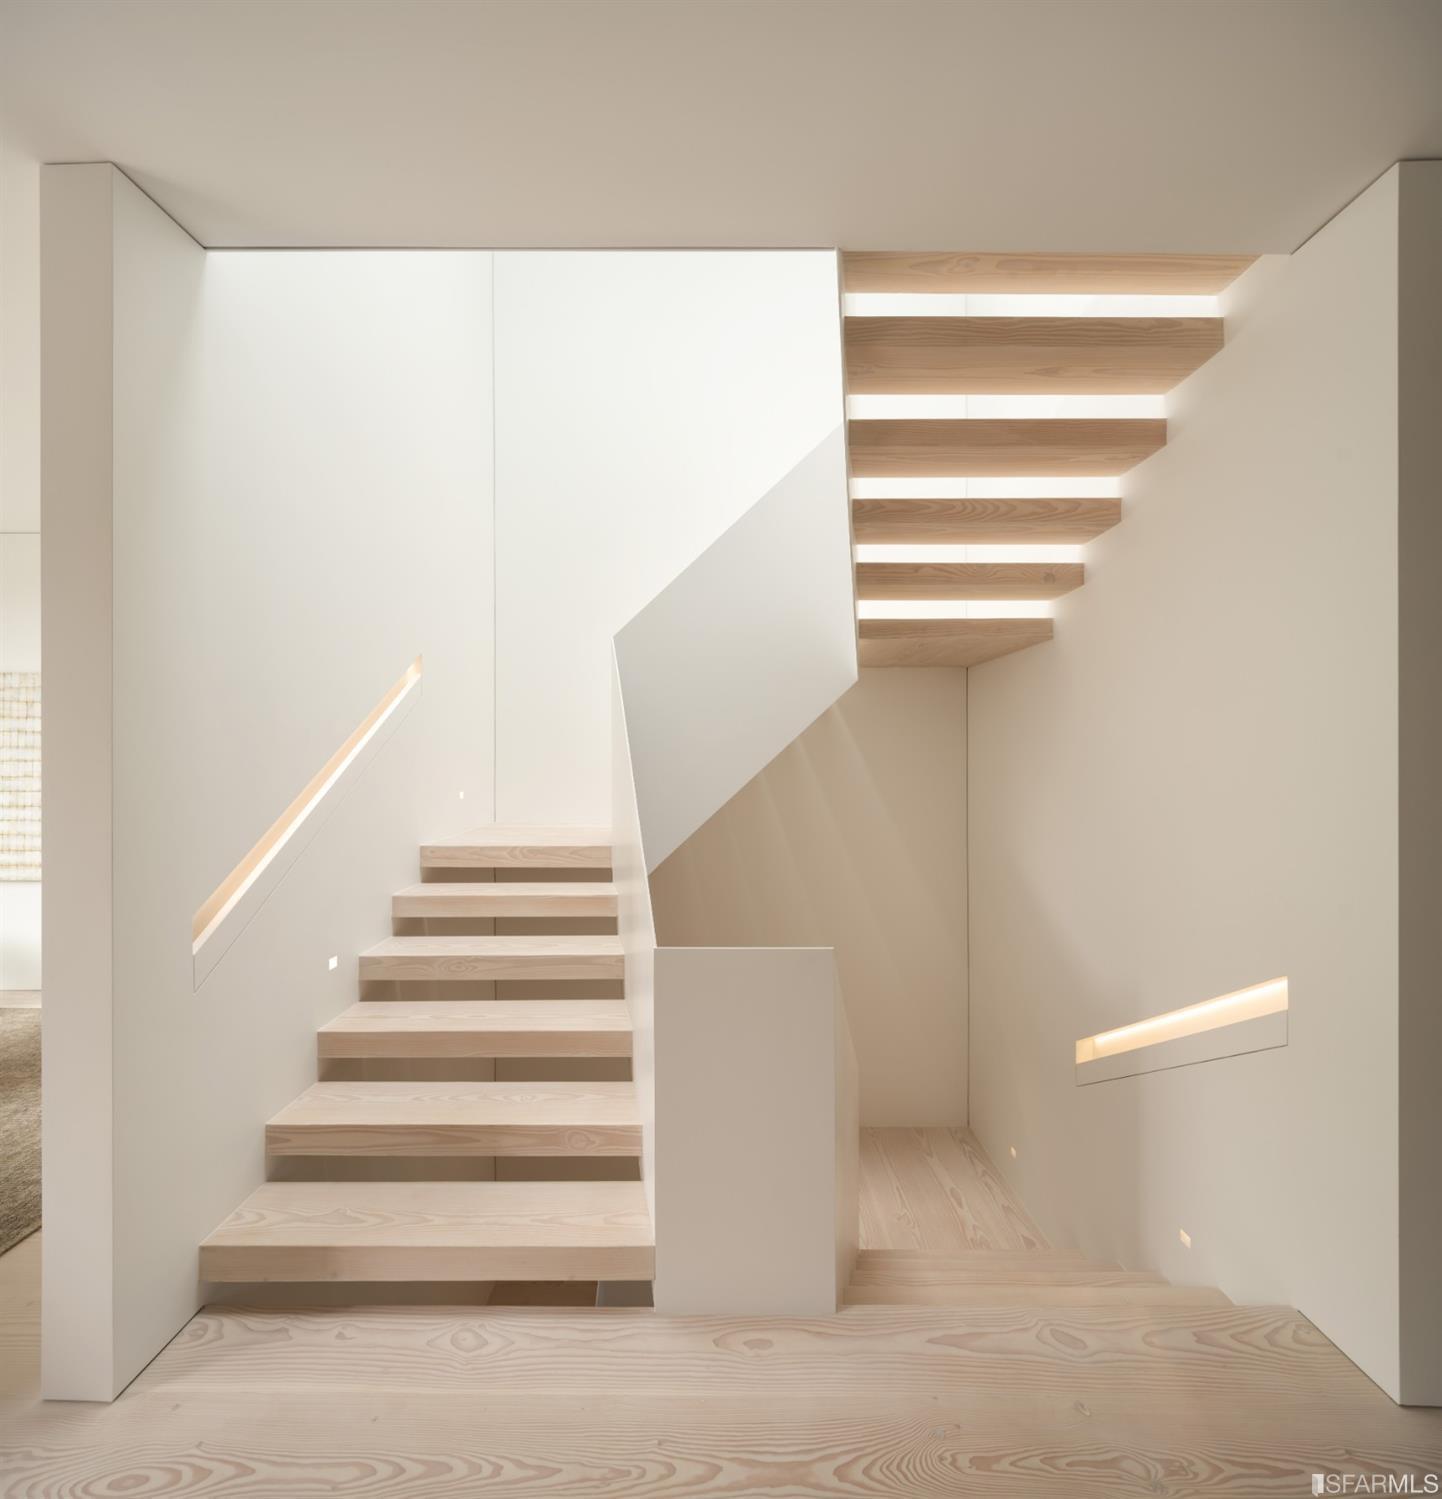 363 Jersey Street, San Francisco stairway